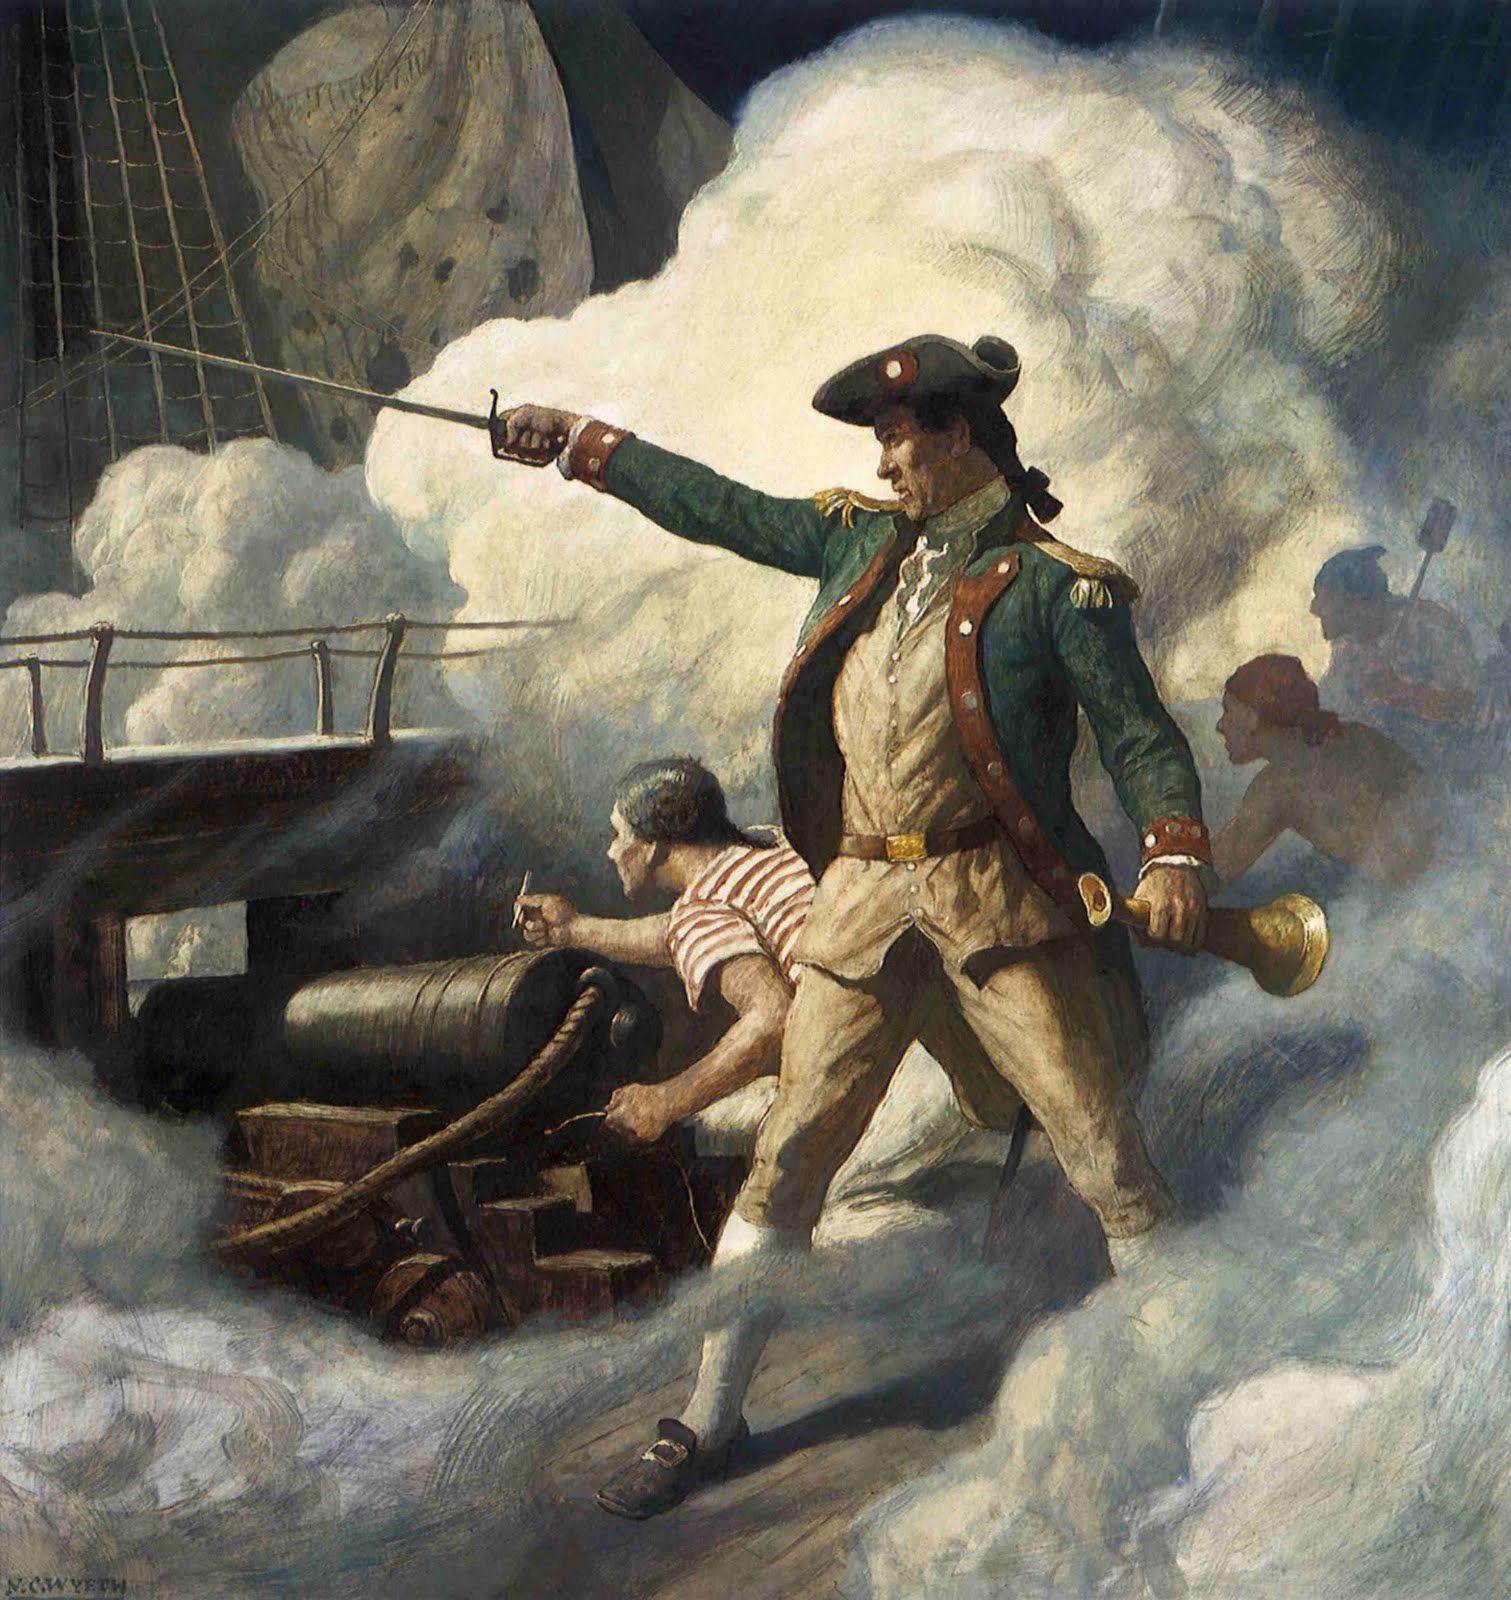 Painting of Captain John Paul Jones by N.C. Wyeth, 1938